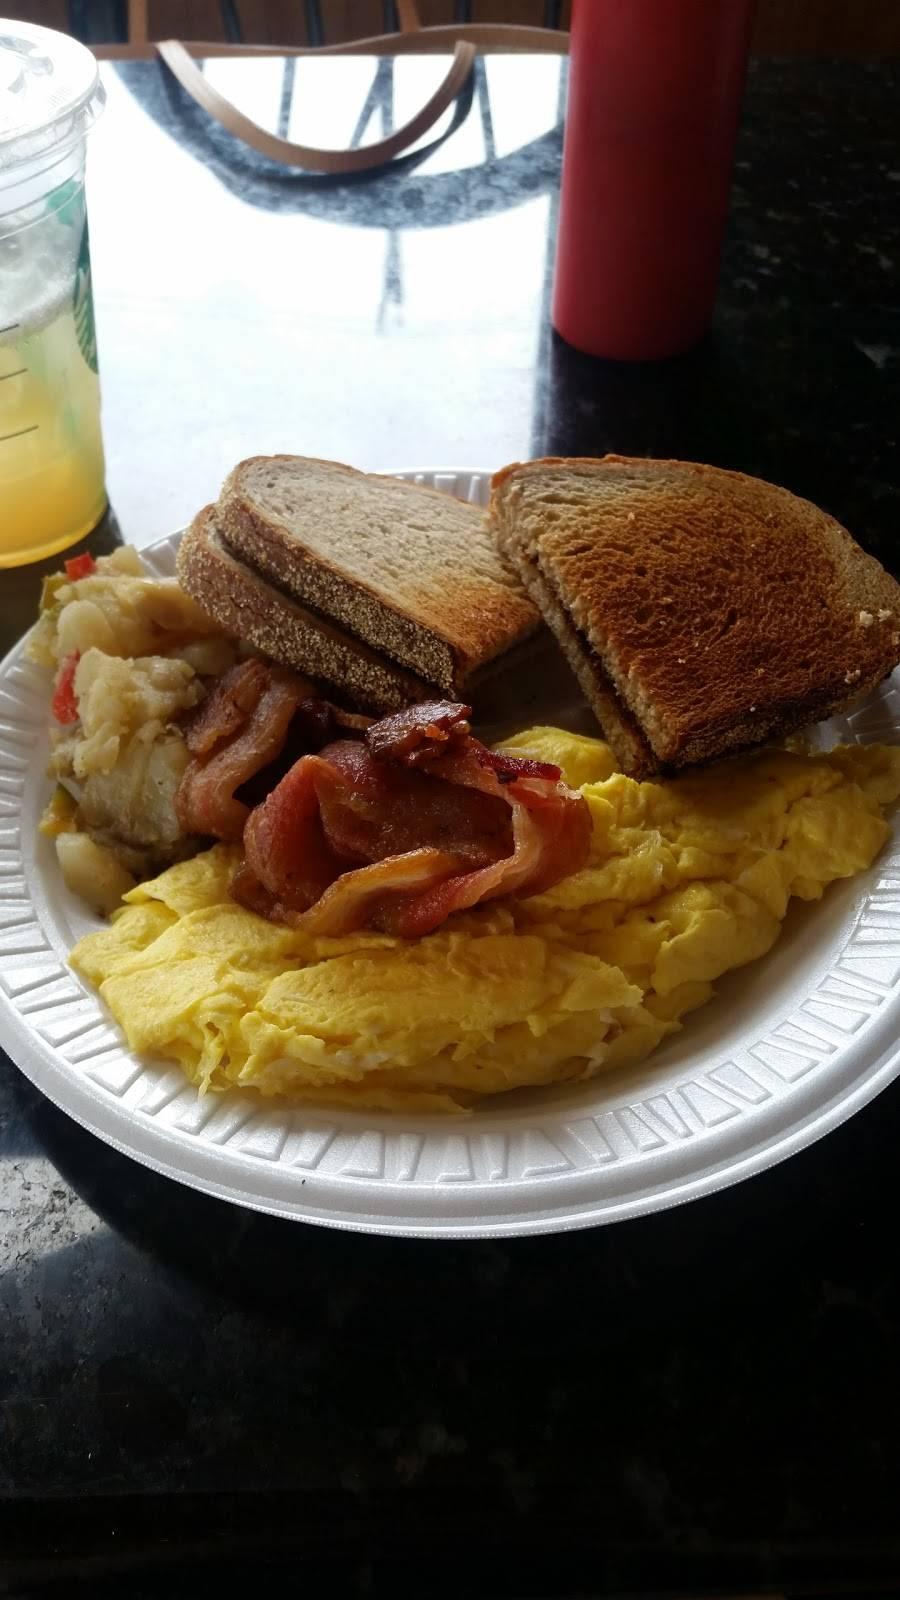 Berry Creek Cafe | restaurant | 55 Moonachie Ave, Moonachie, NJ 07074, USA | 2019336540 OR +1 201-933-6540